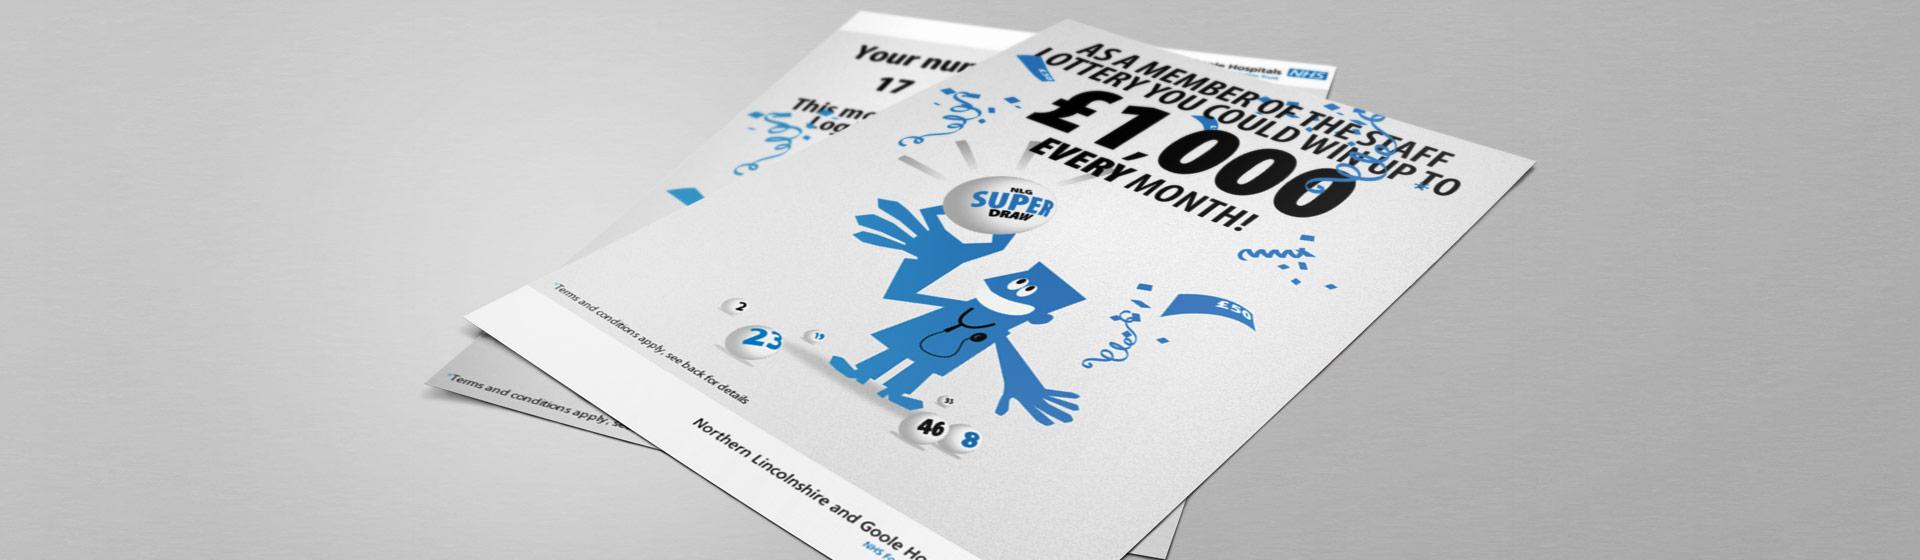 Staff Portal - Superdraw Lottery Flyer Design